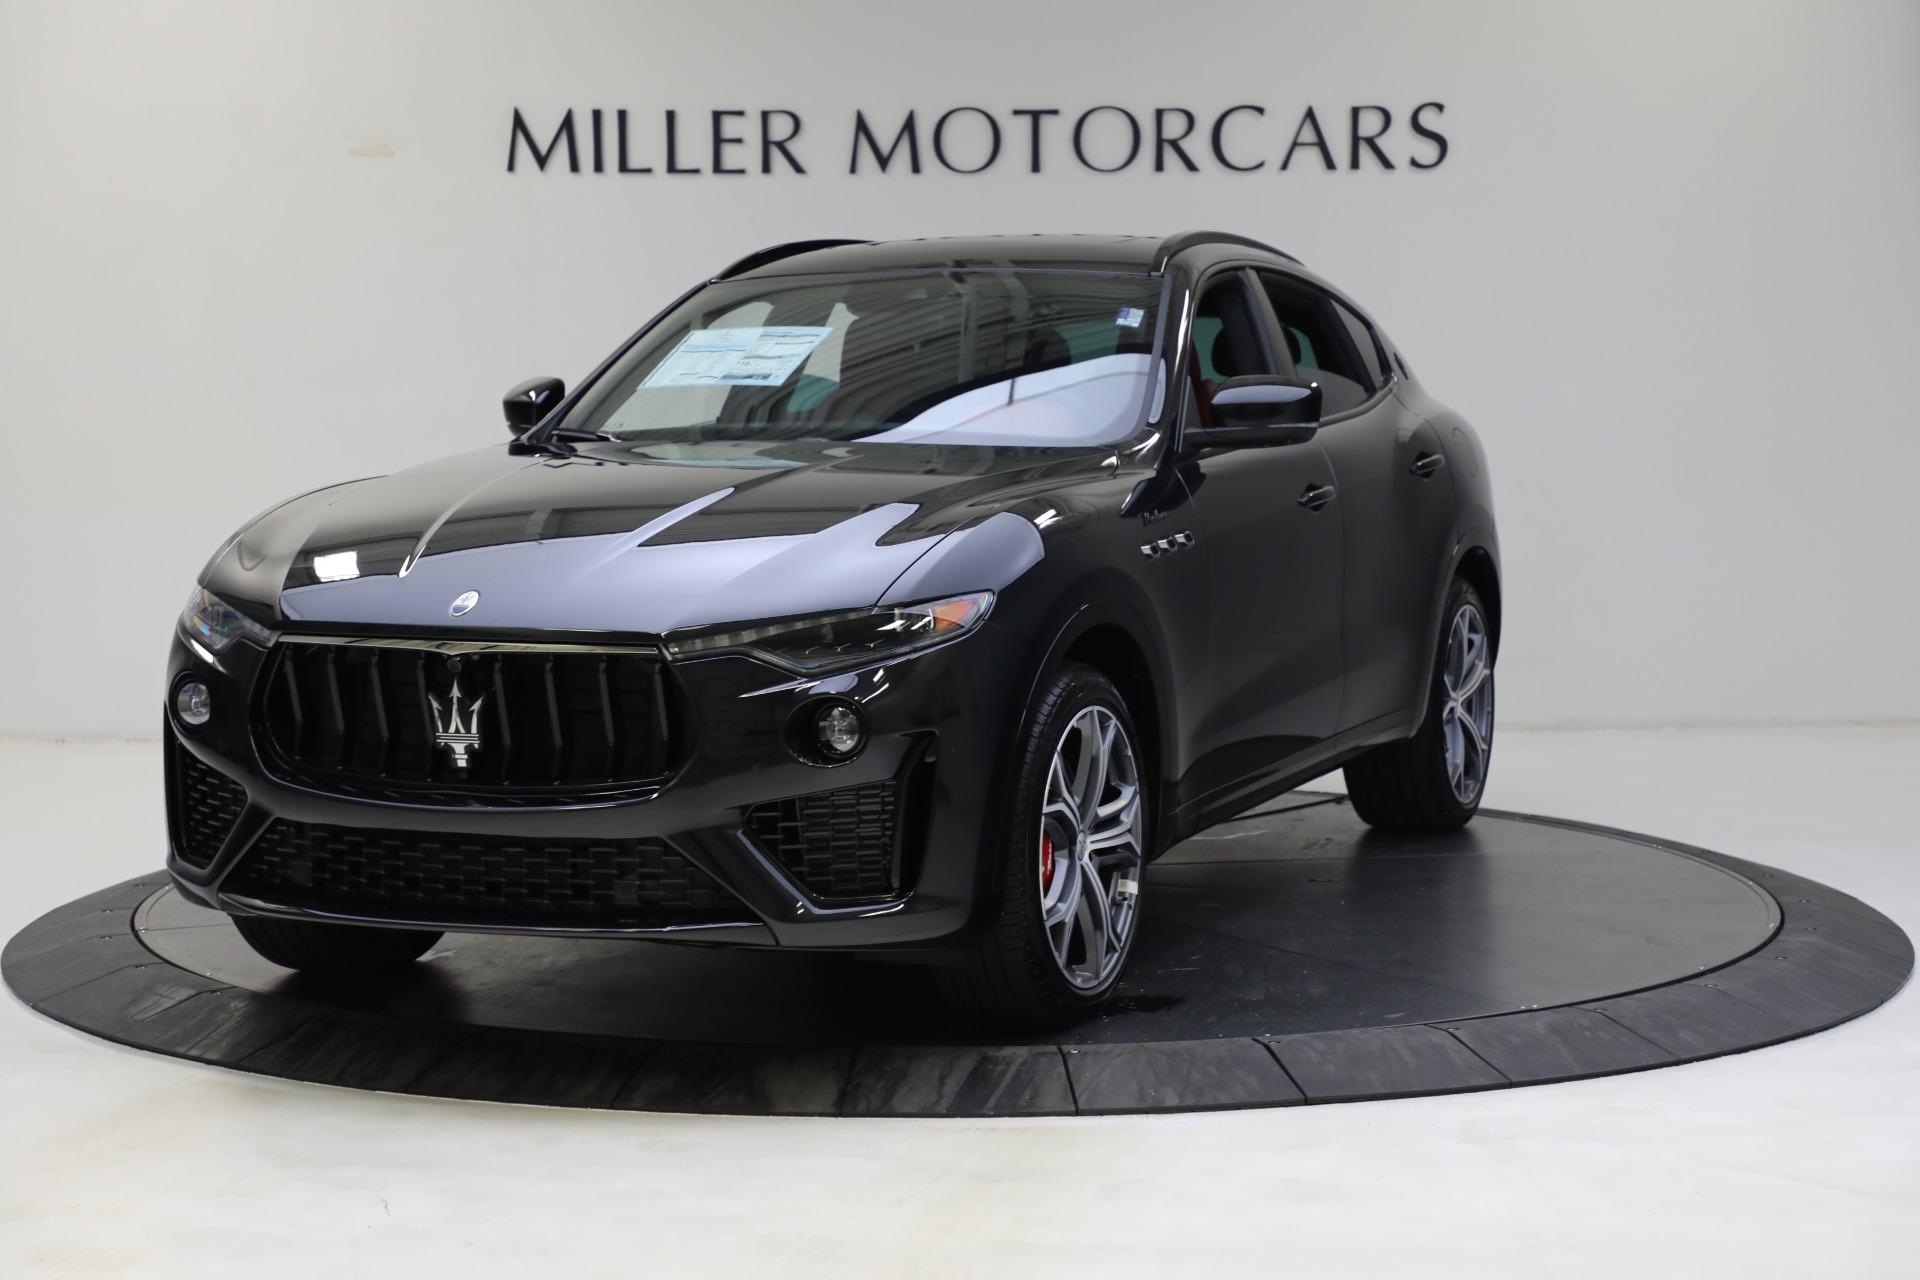 New 2022 Maserati Levante Modena for sale $113,375 at Bentley Greenwich in Greenwich CT 06830 1